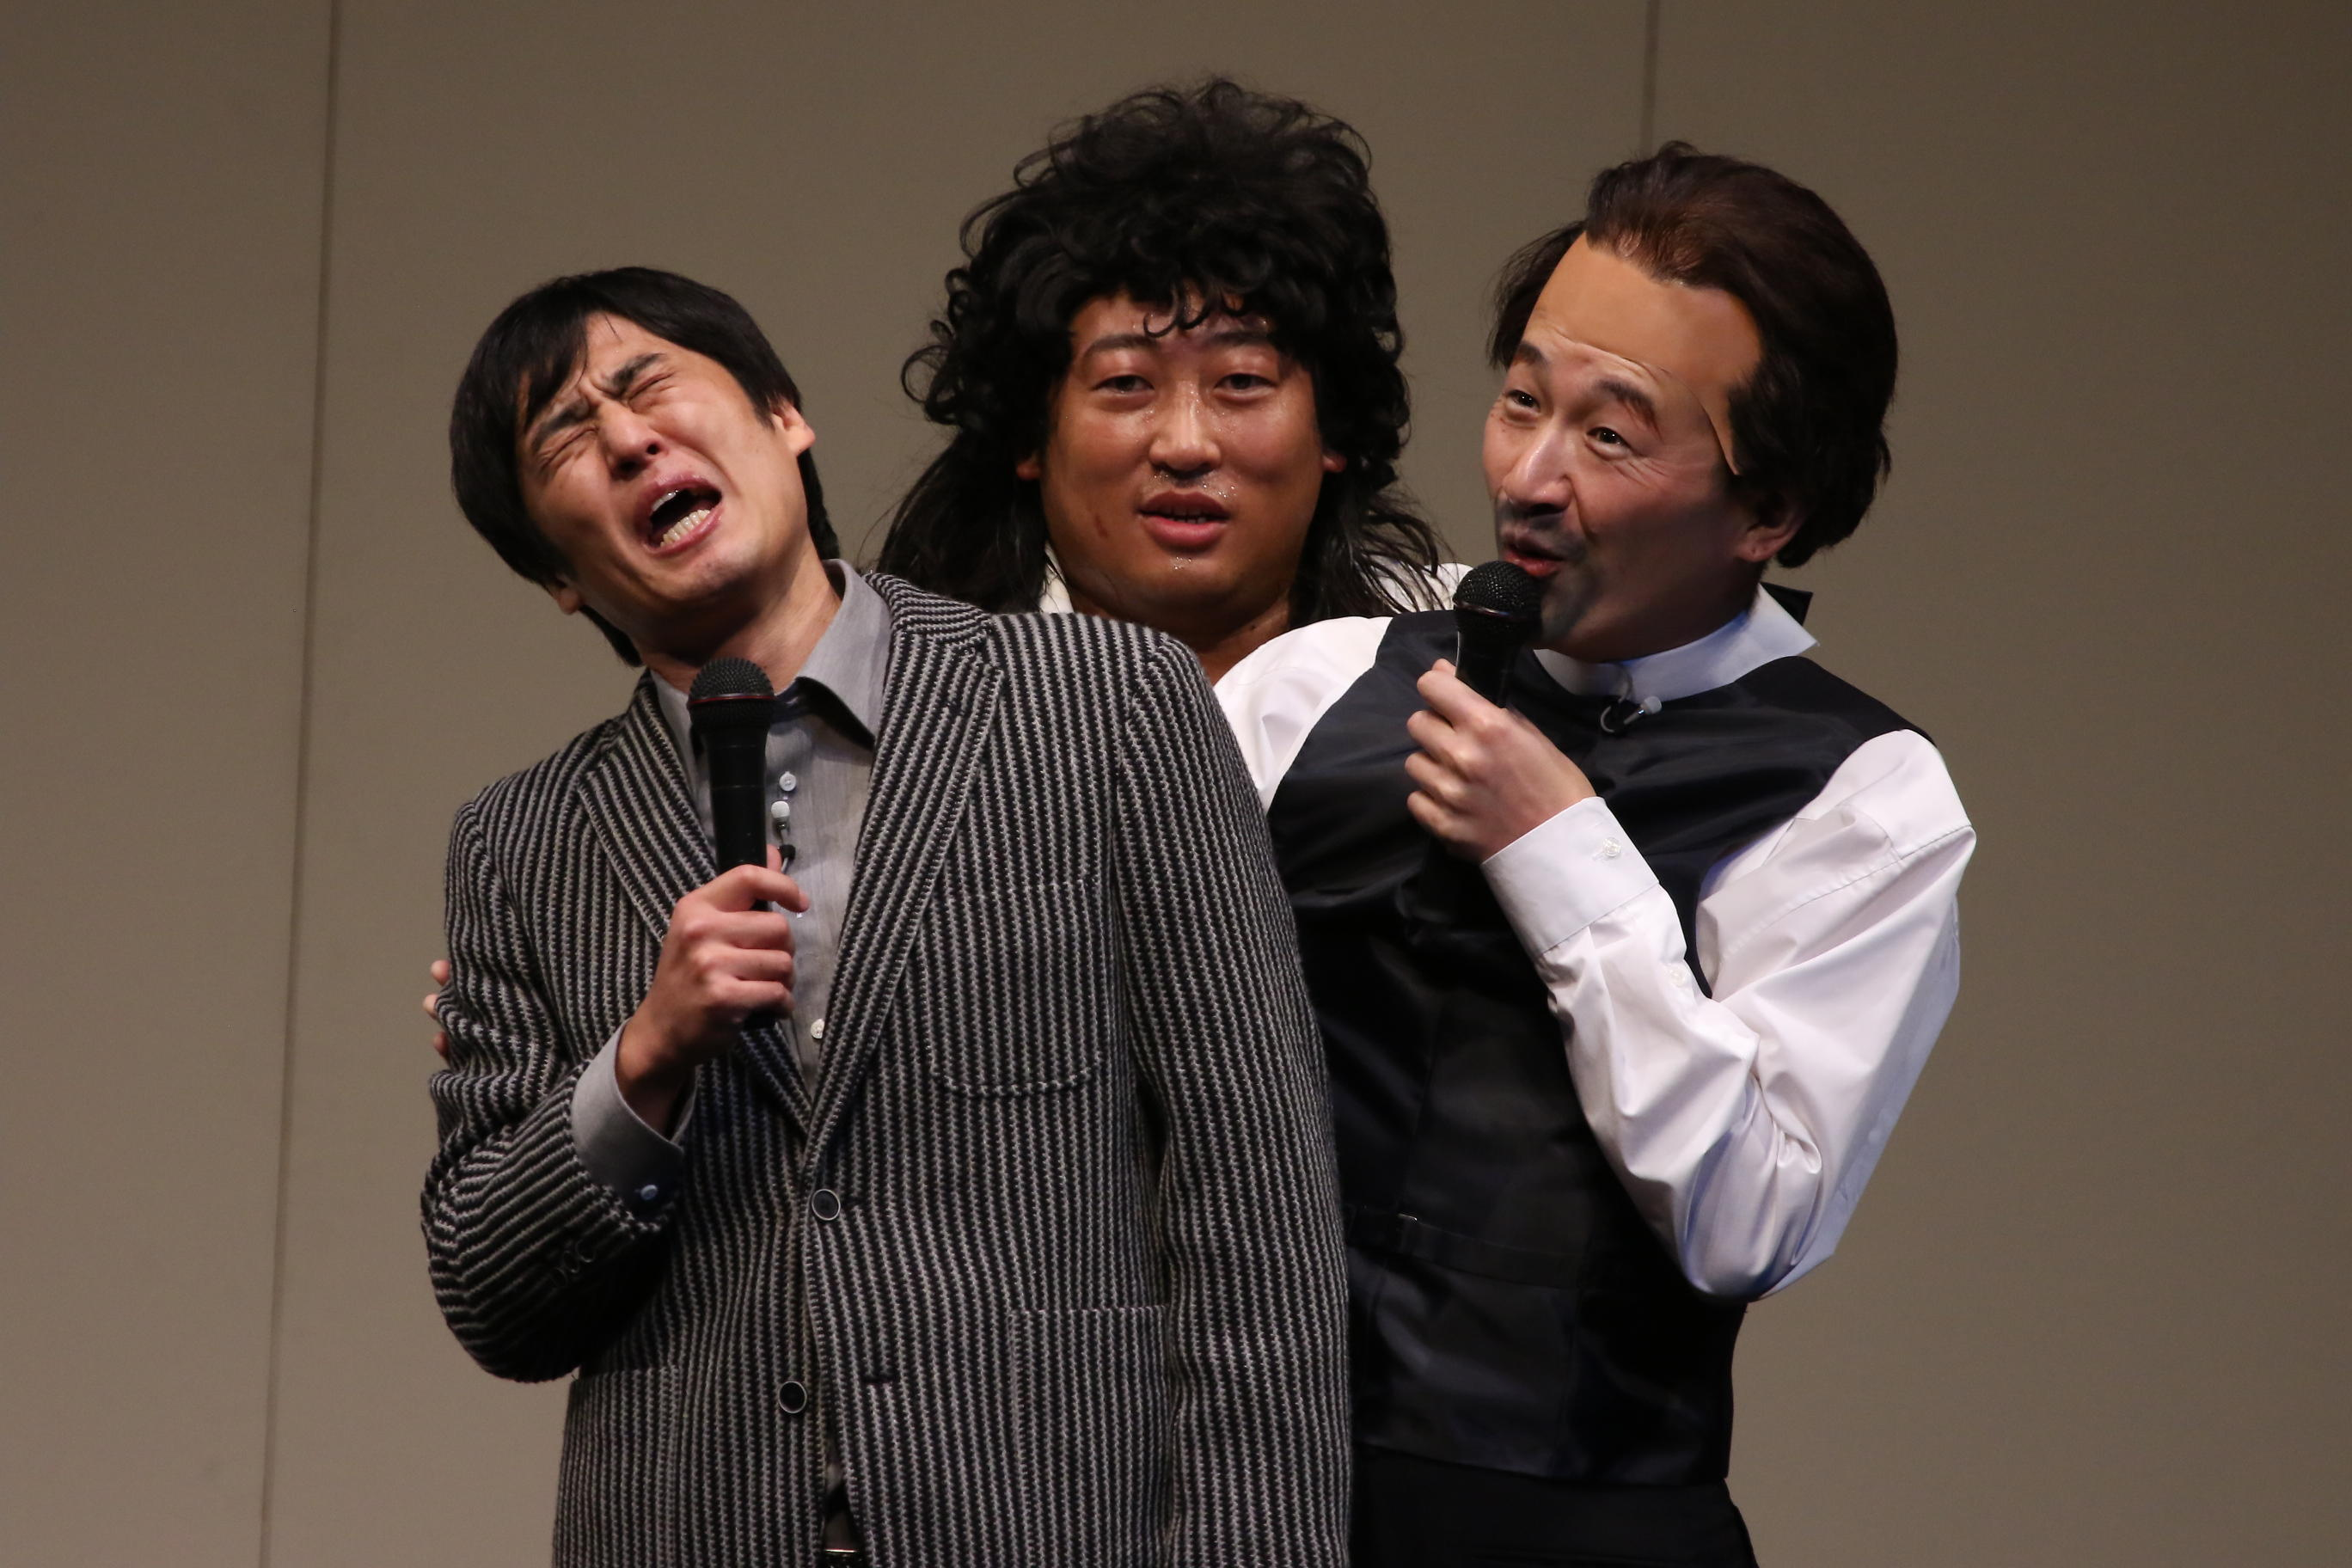 http://news.yoshimoto.co.jp/20190111101813-a3d5e6e9838d7dbb42a6b5b77ebb490c0a43903a.jpg